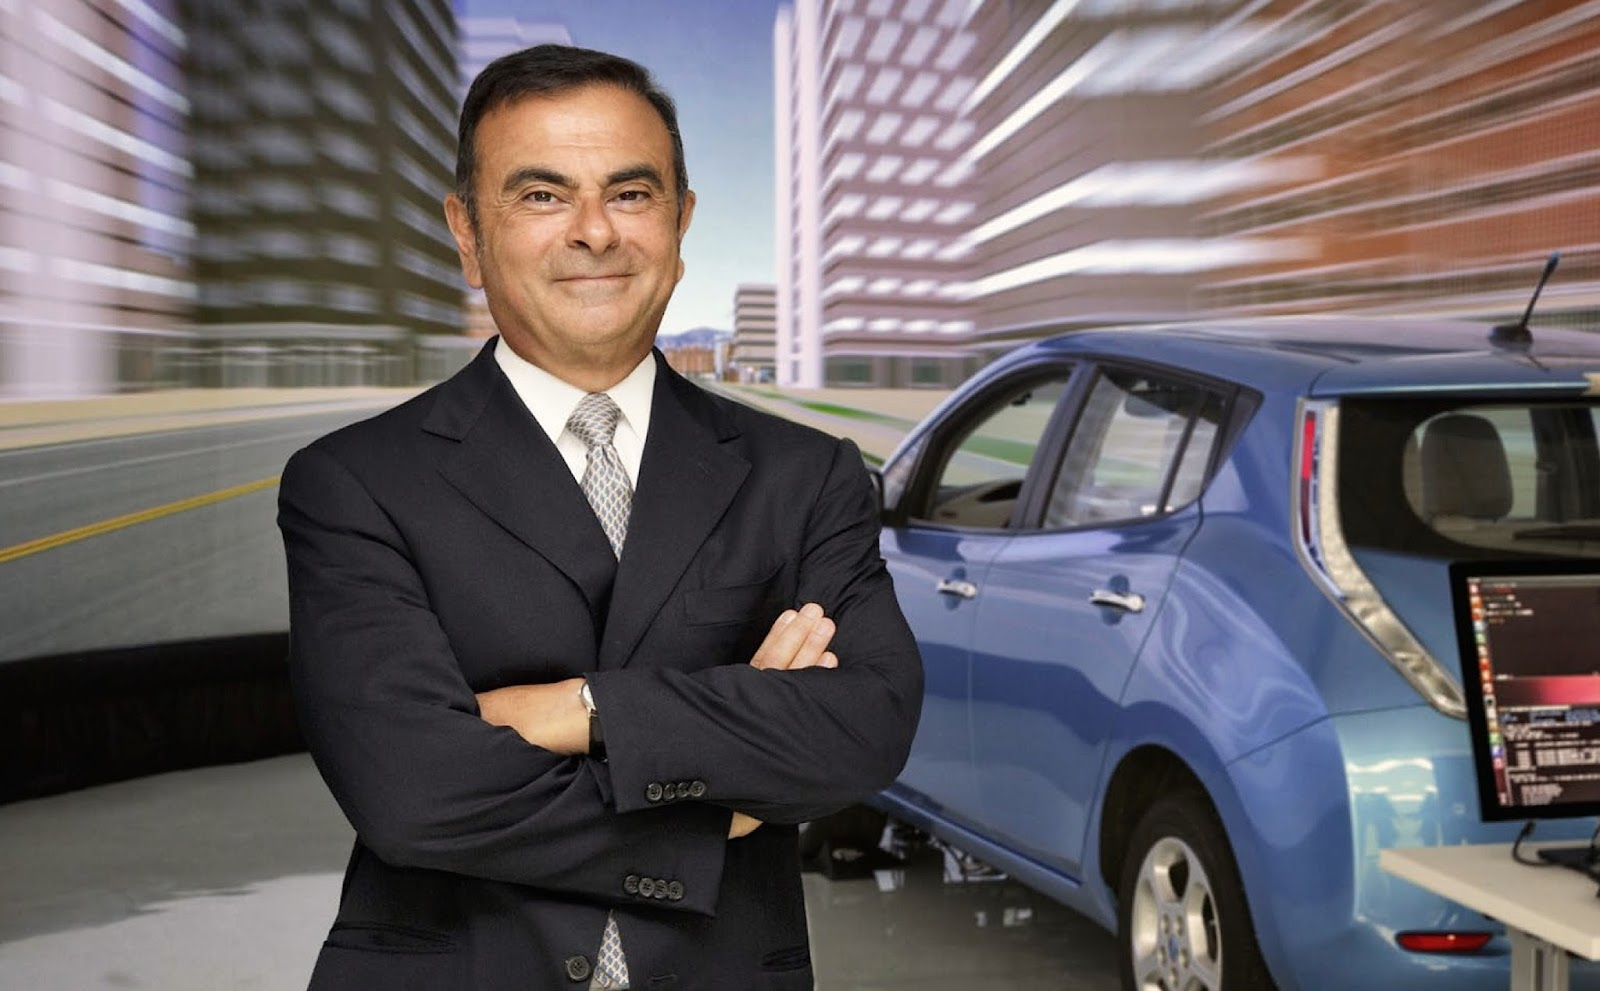 ghosn report Η Nissan όχι μόνο παράγει «καθαρά αυτοκίνητα» αλλά την ενδιαφέρει και ο τρόπος παραγωγής να είναι «πράσινος»